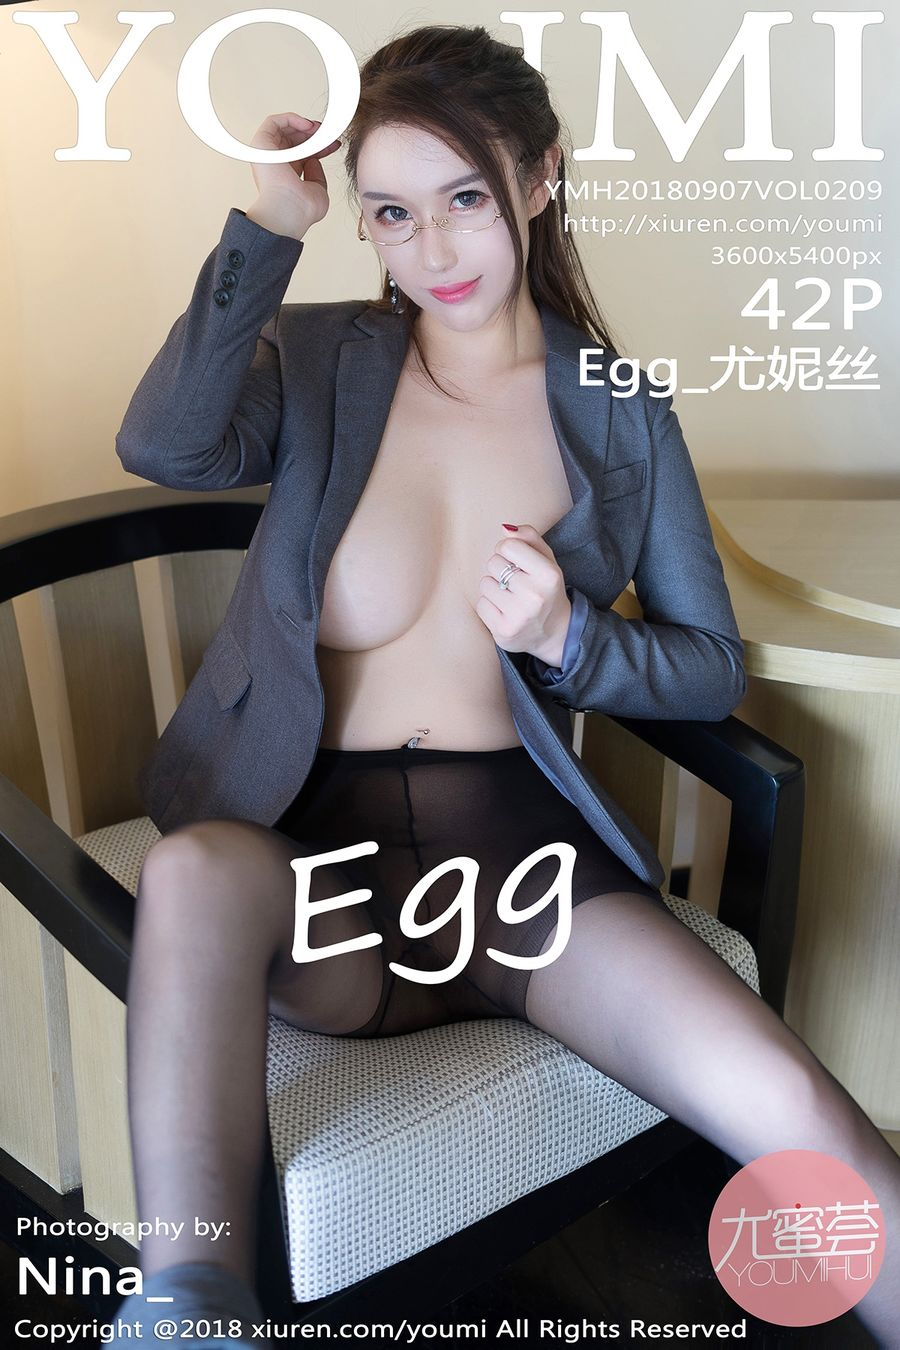 [YOUMI尤蜜荟] VOL.209 Egg_尤妮丝 [42+1P/121M]